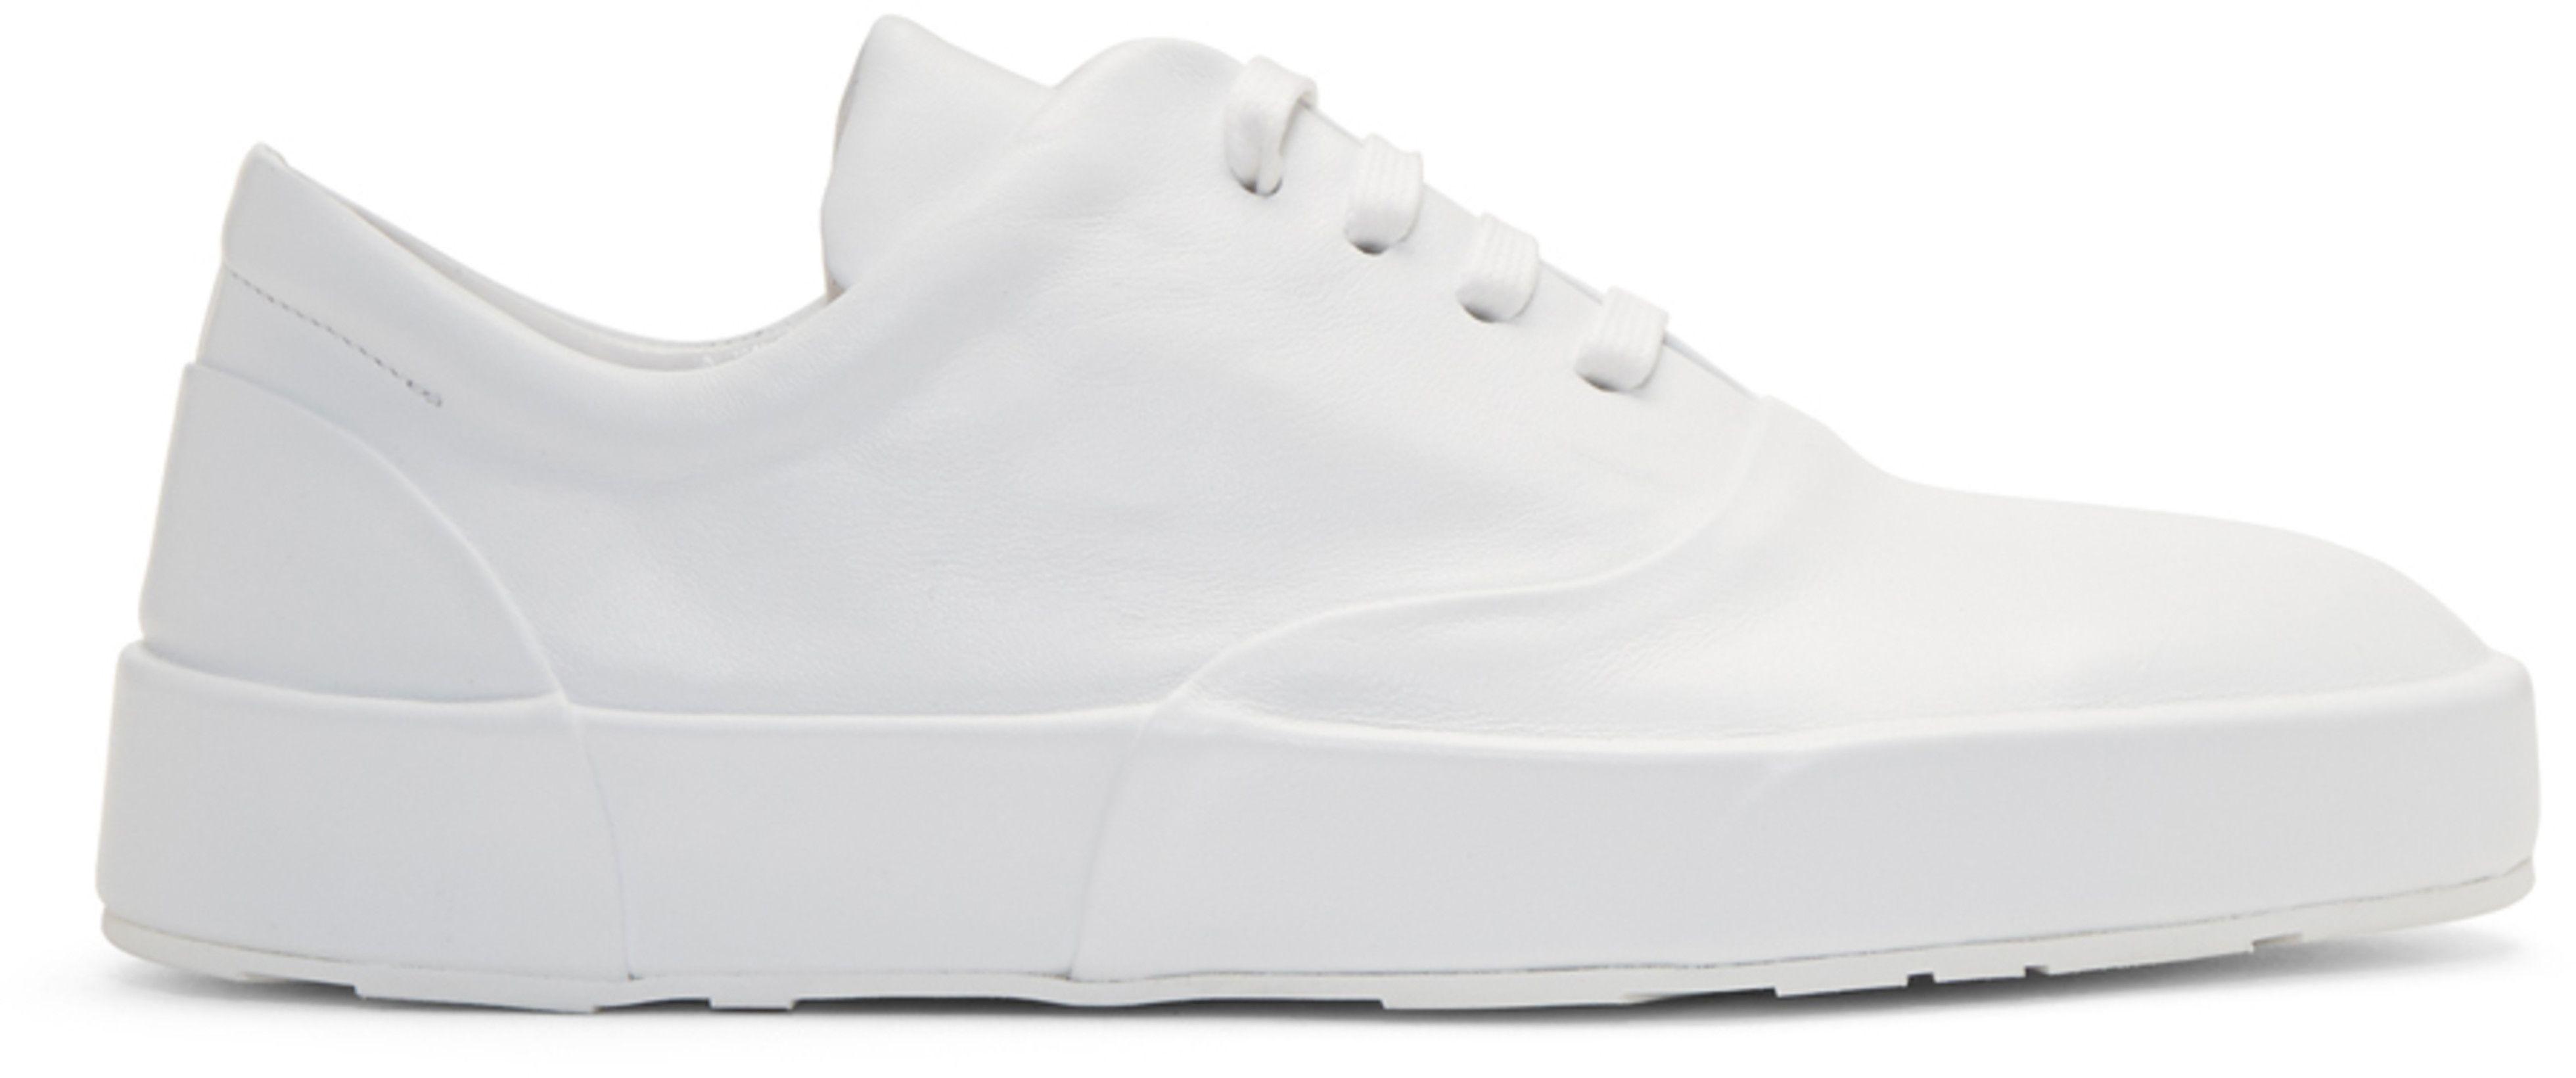 Jil Sander White Leather Classic Sneakers dnwnunrT